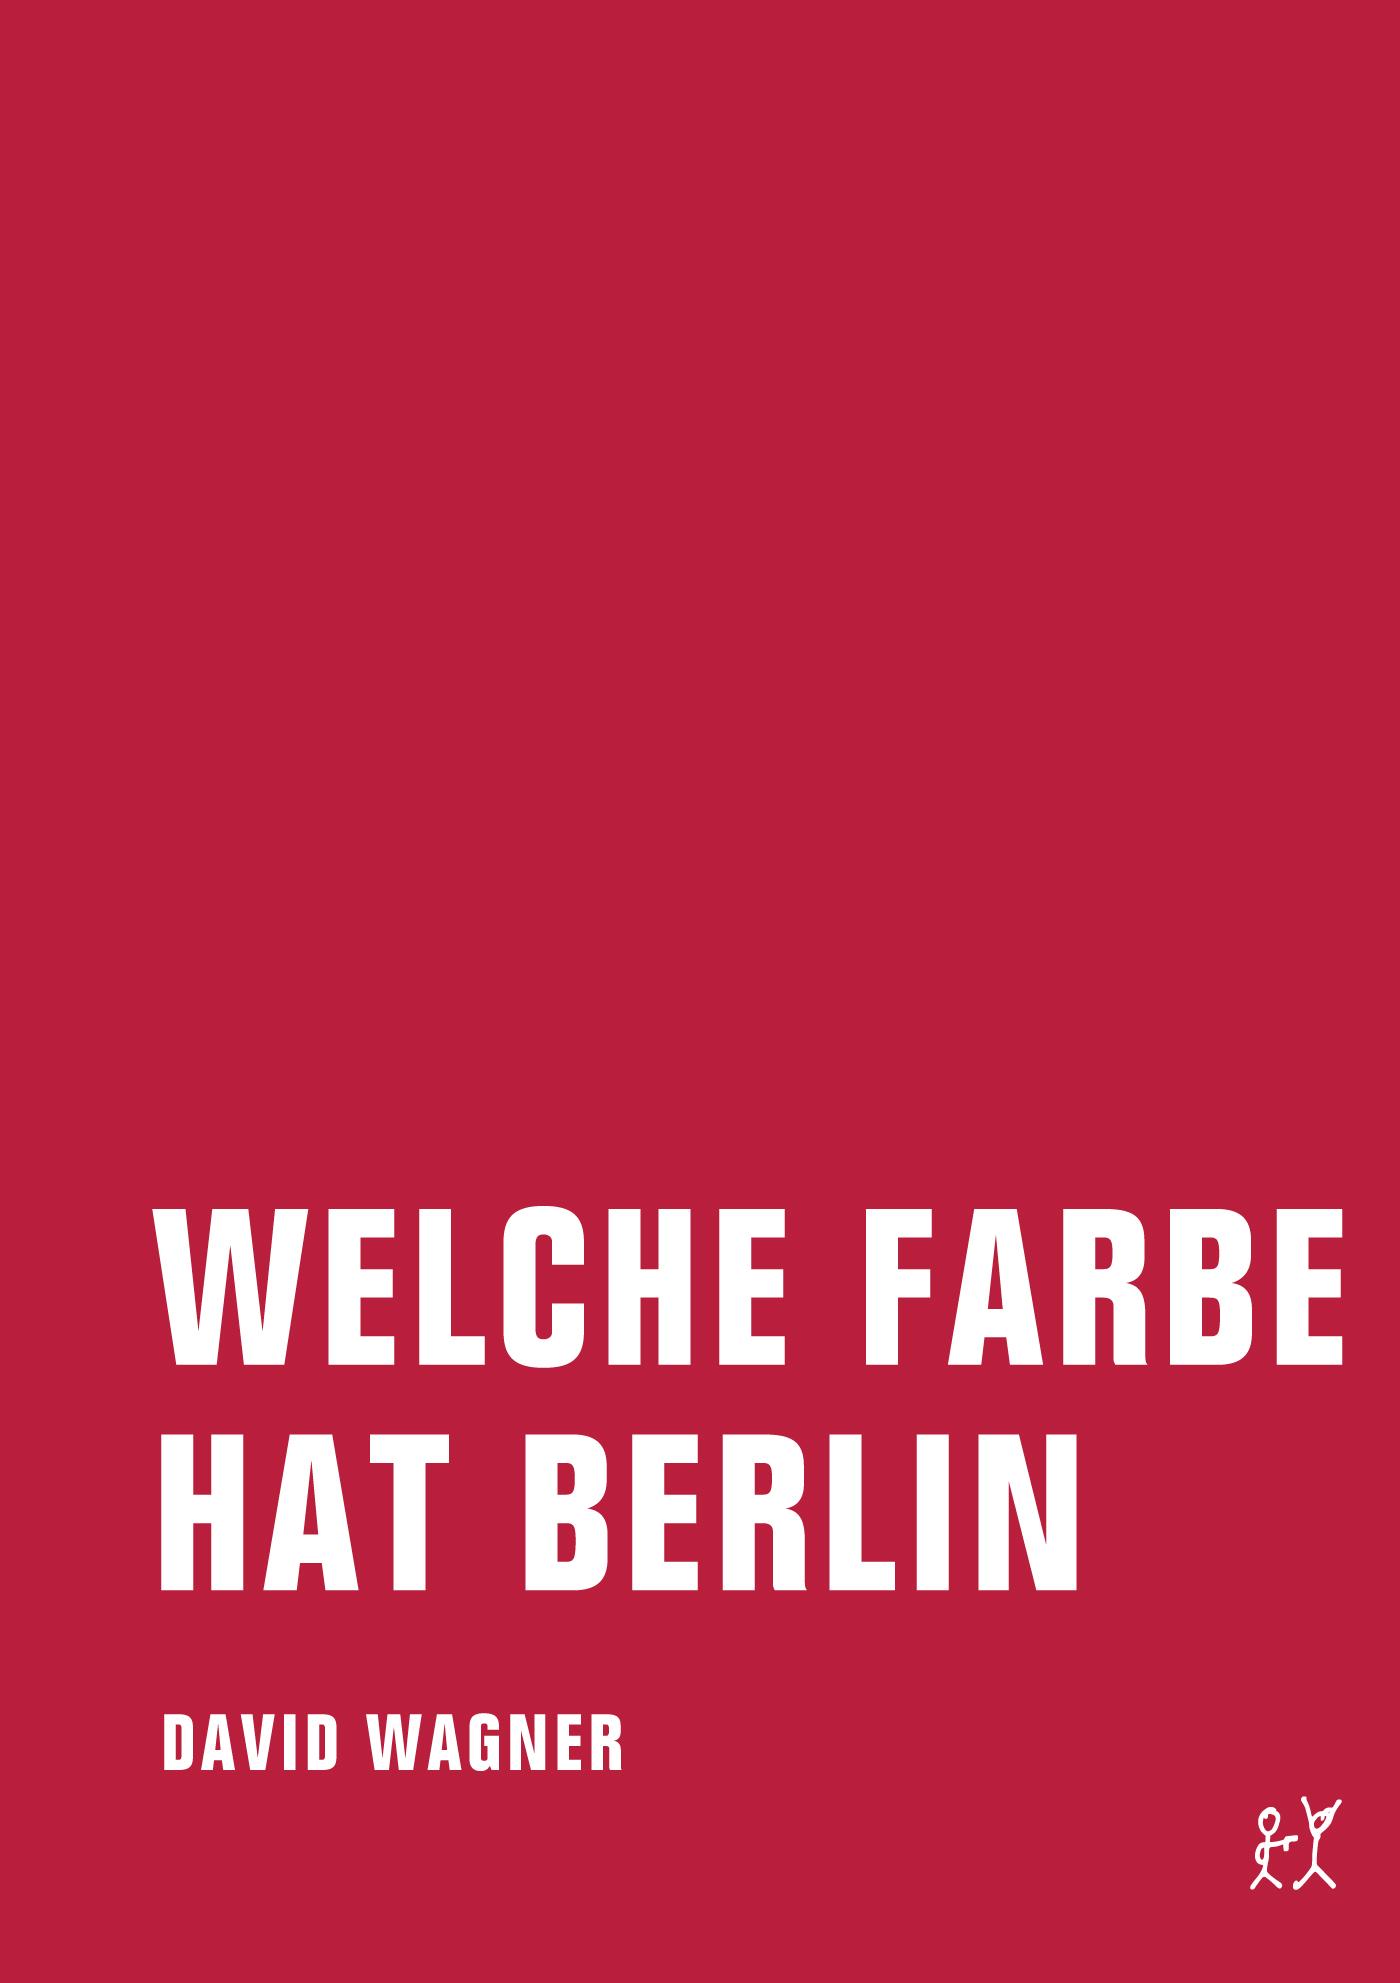 David Wagner Welche Farbe hat Berlin david wagner elu